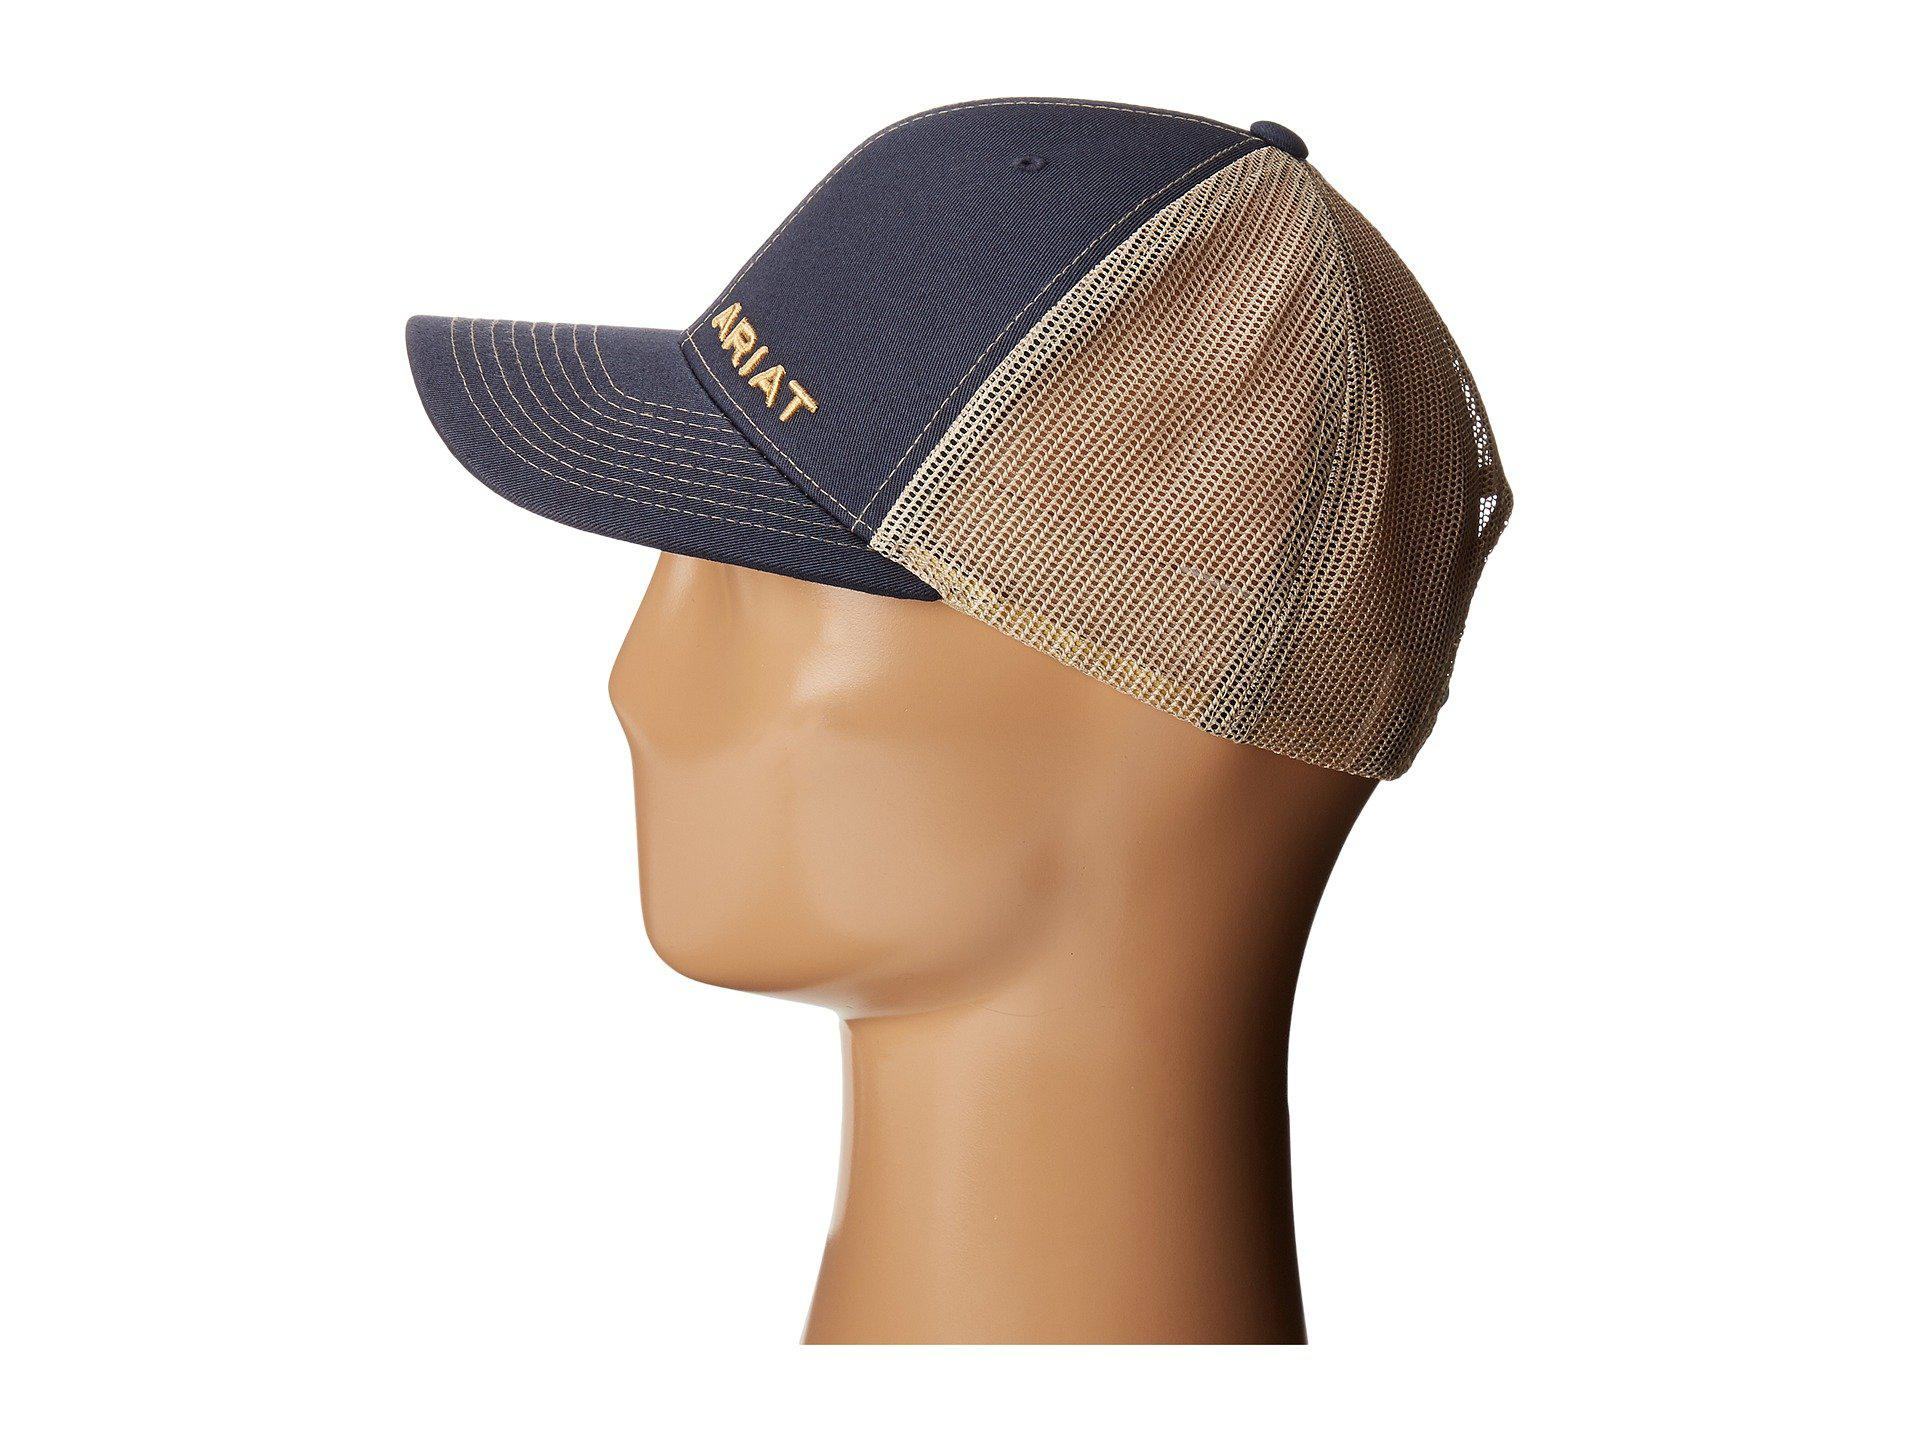 eedc4e559d3 ... uk lyst ariat 1508903 navy cowboy hats in blue for men c6b42 89e12